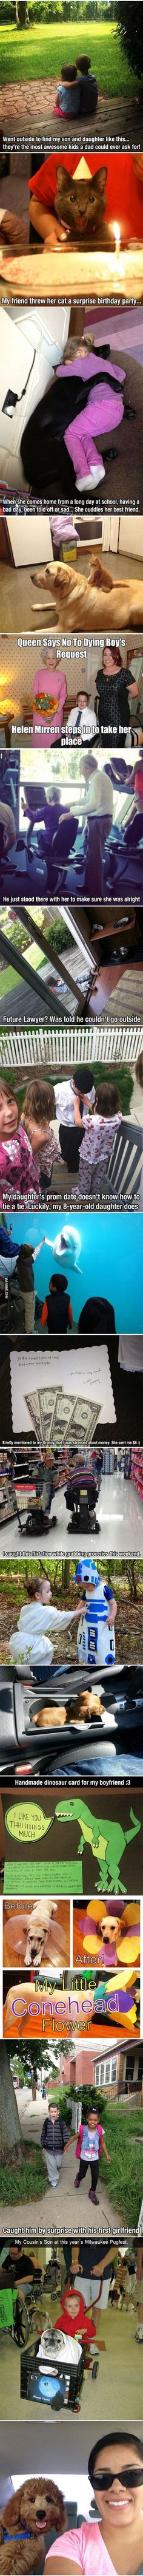 Did this make you smile?